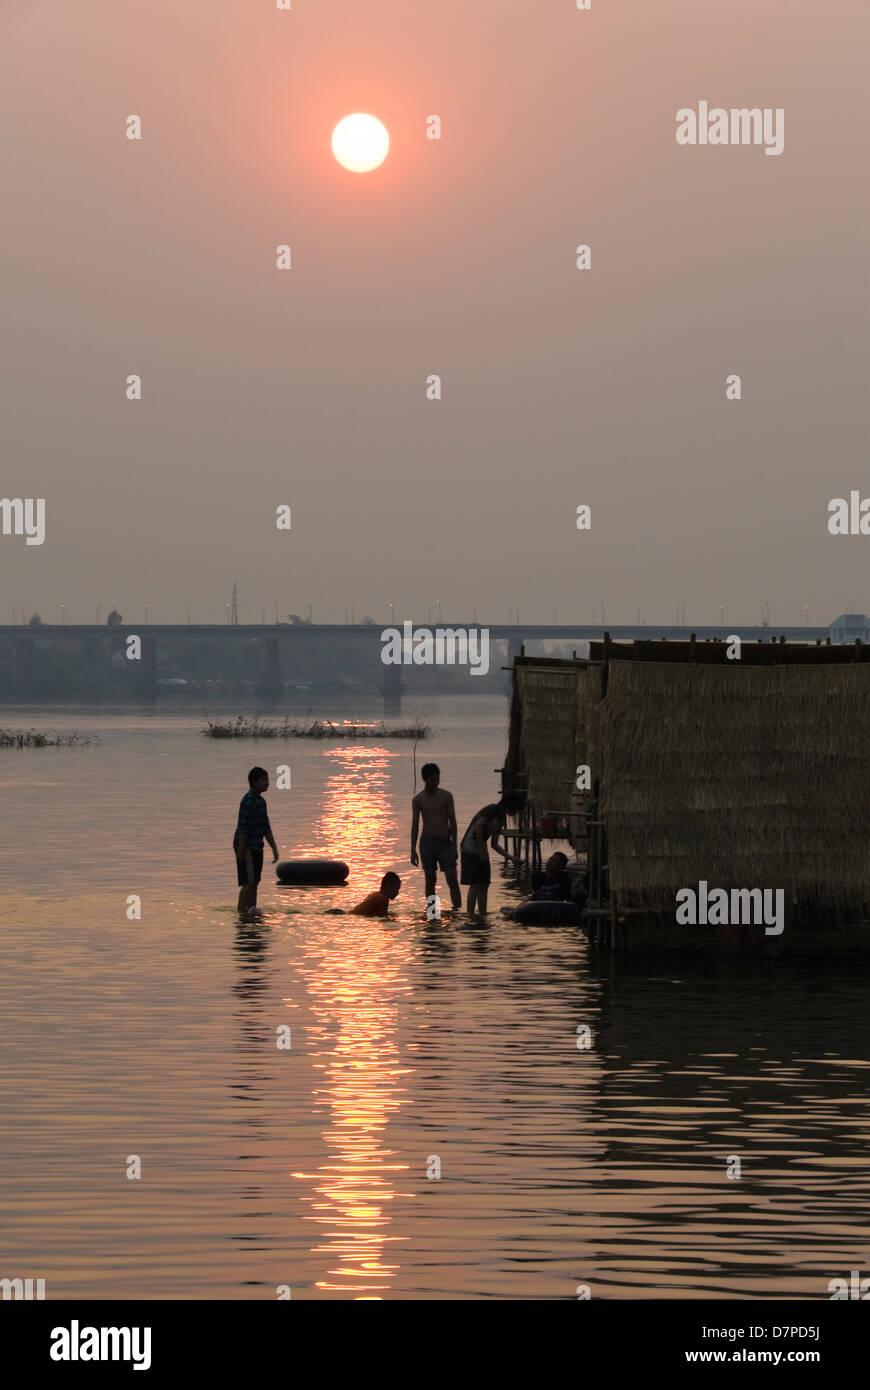 Sundown on Mon River, Sonnenuntergangsstimmung am Mon Fluss Stock Photo